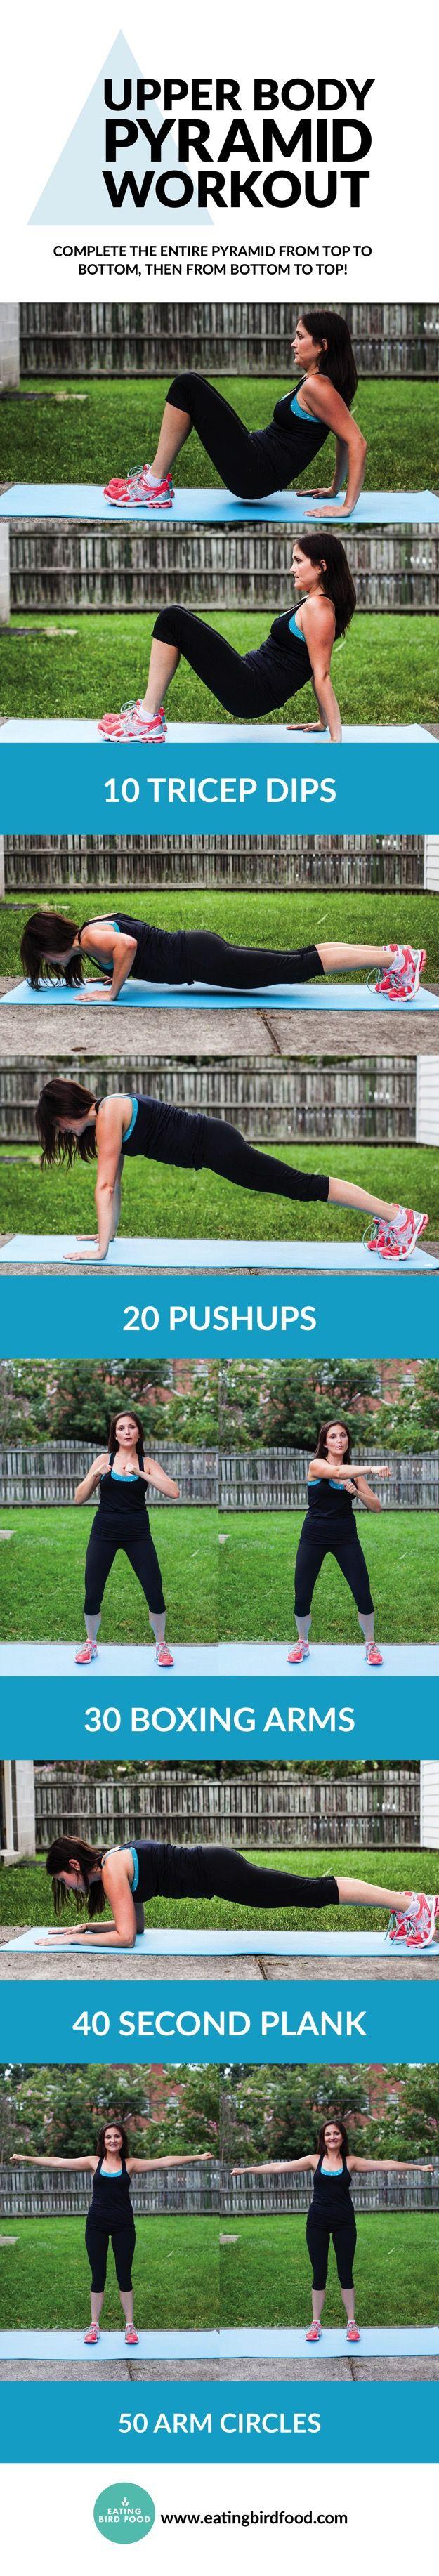 Upper Body Pyramid Workout Things I like Pinterest Workout